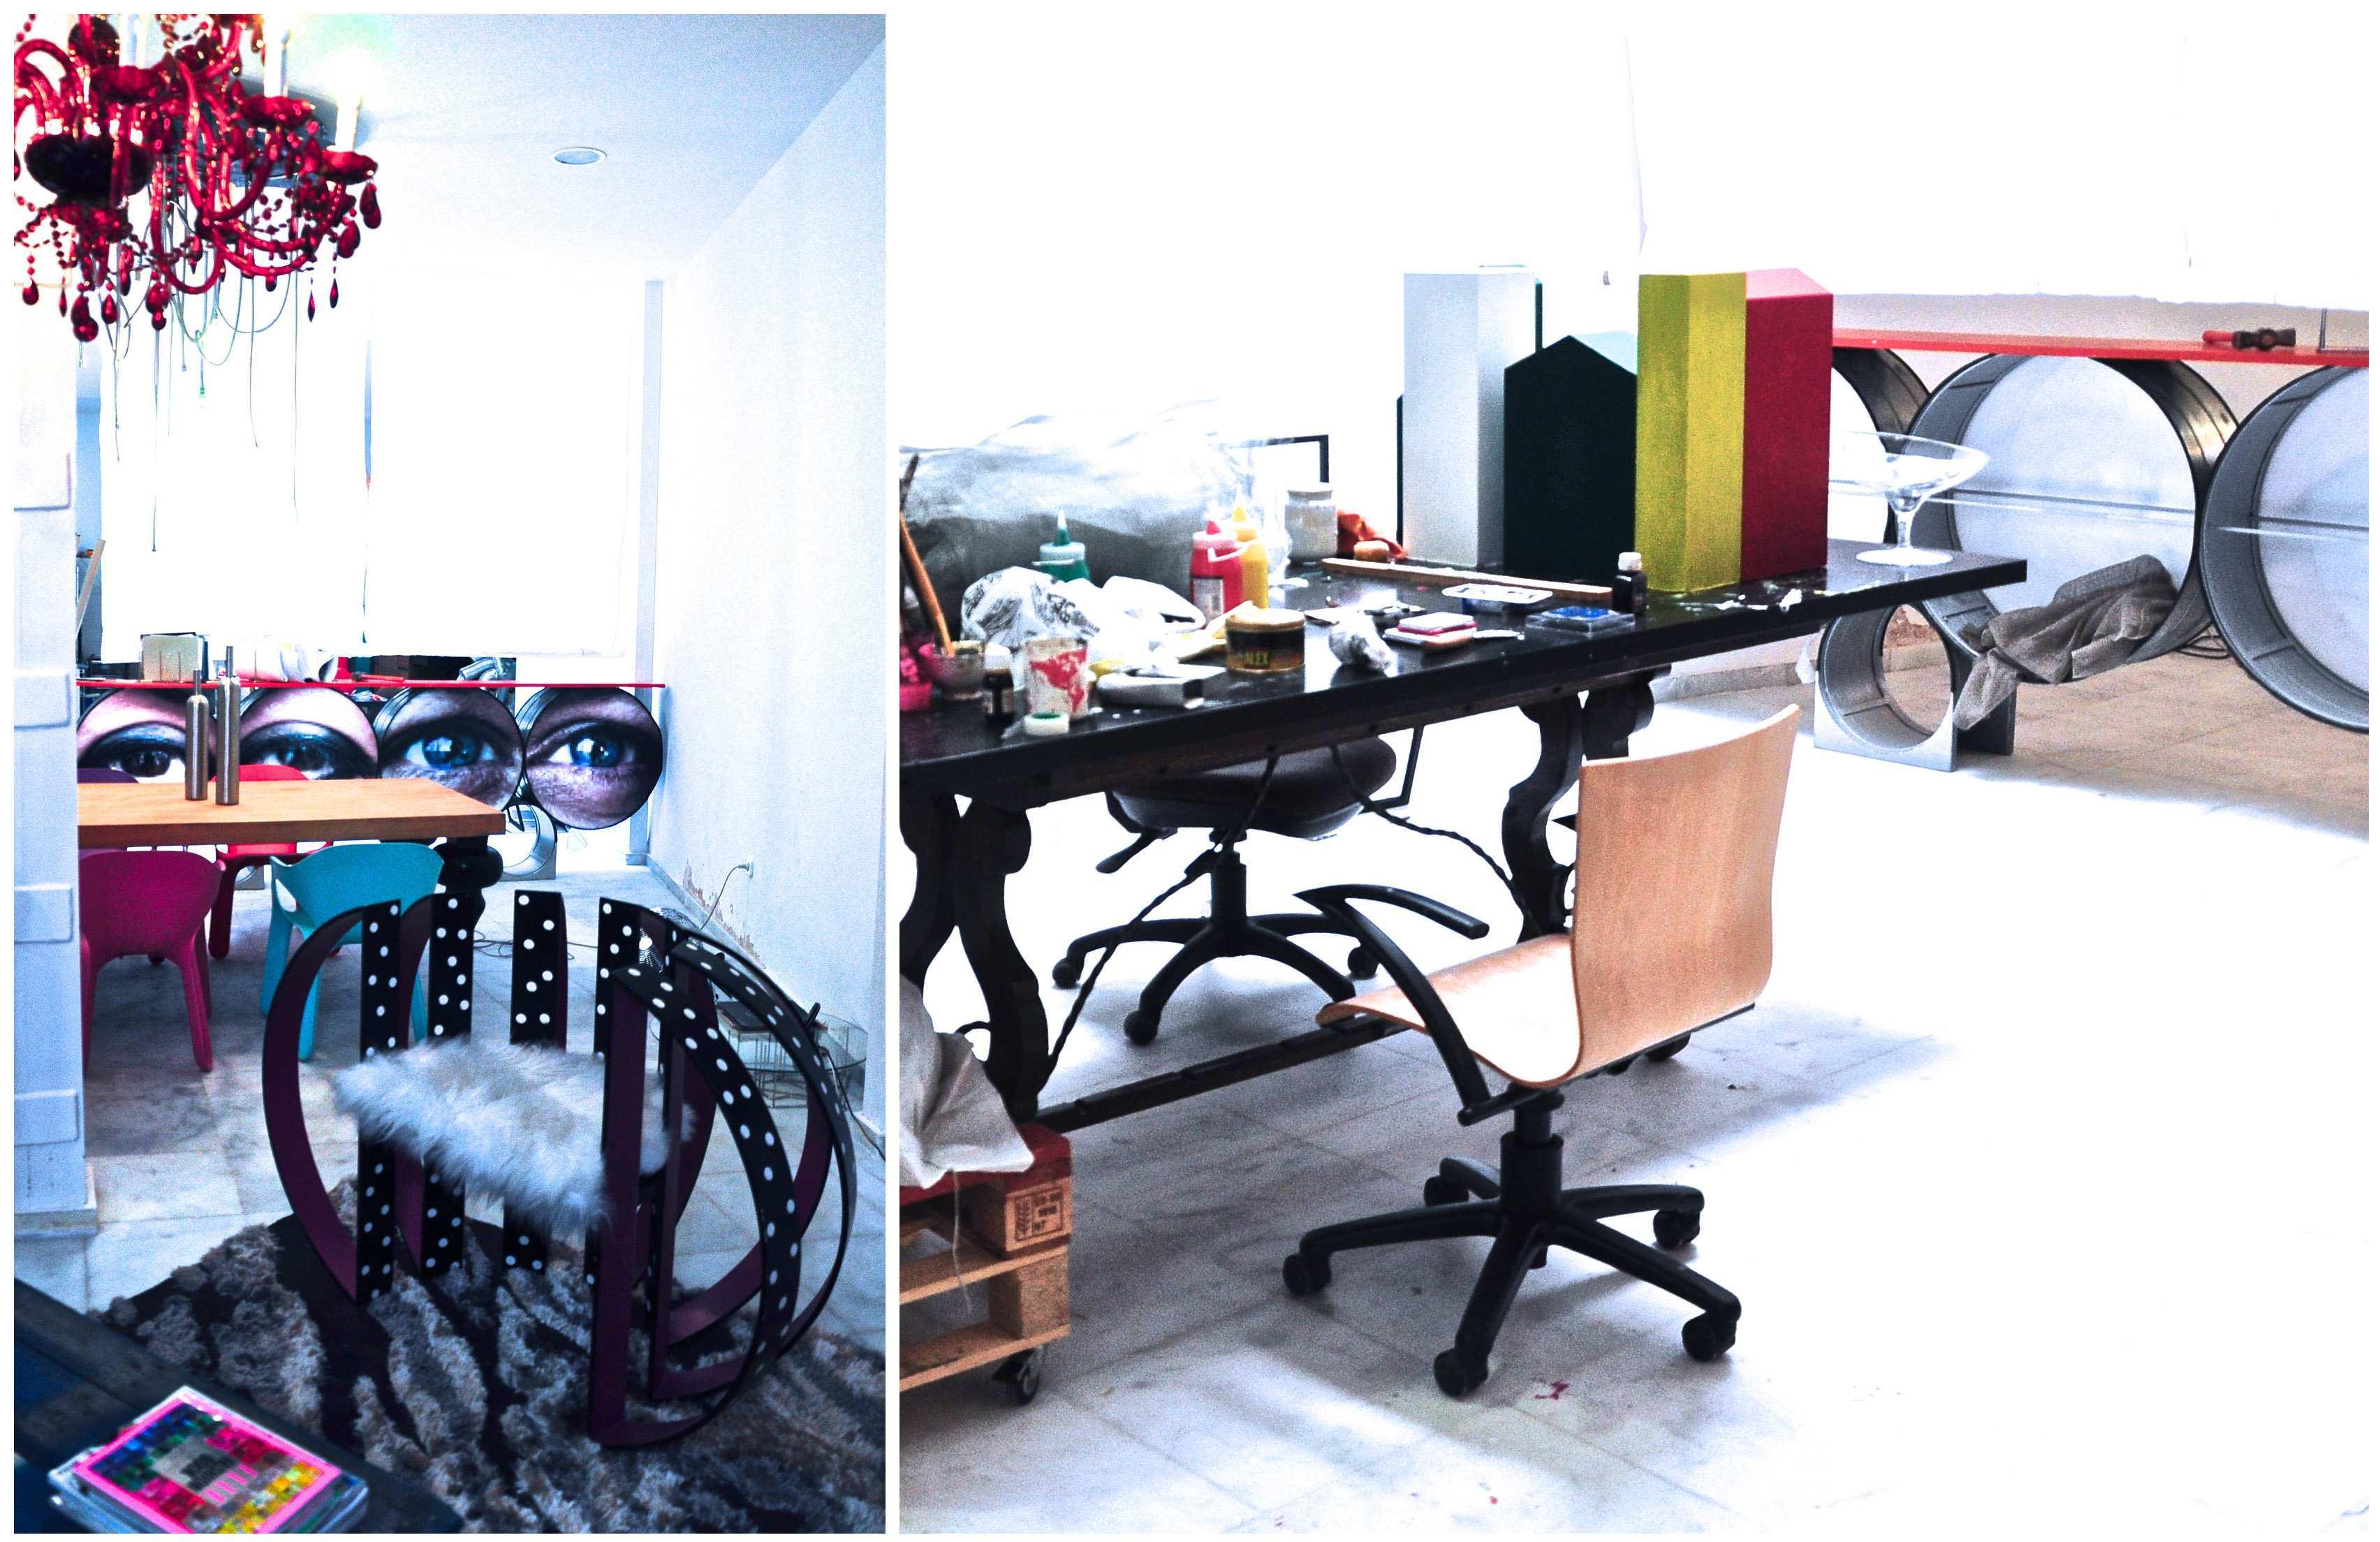 Studio Universo Eirín